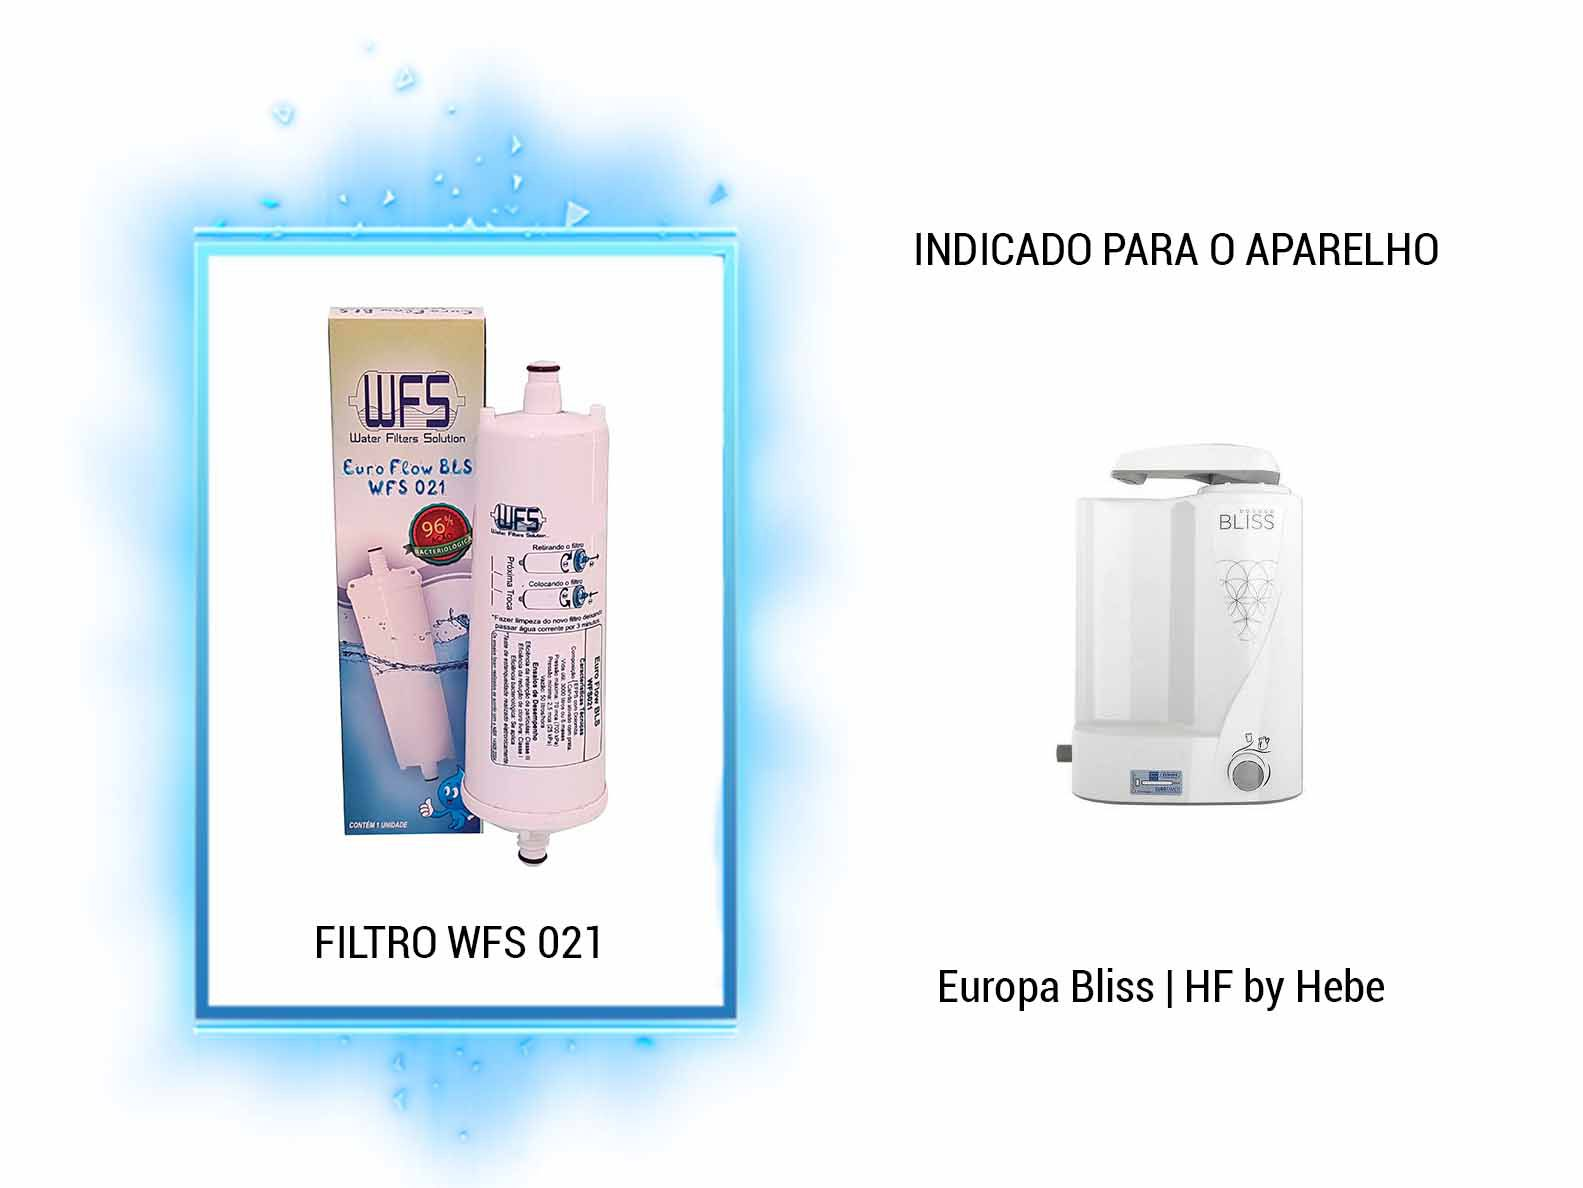 FILTRO BEBEDOURO EUROPA (EUROFLOW BLS) Refil Purificador Europa Bliss  Wfs 021   Europa Flow BLS